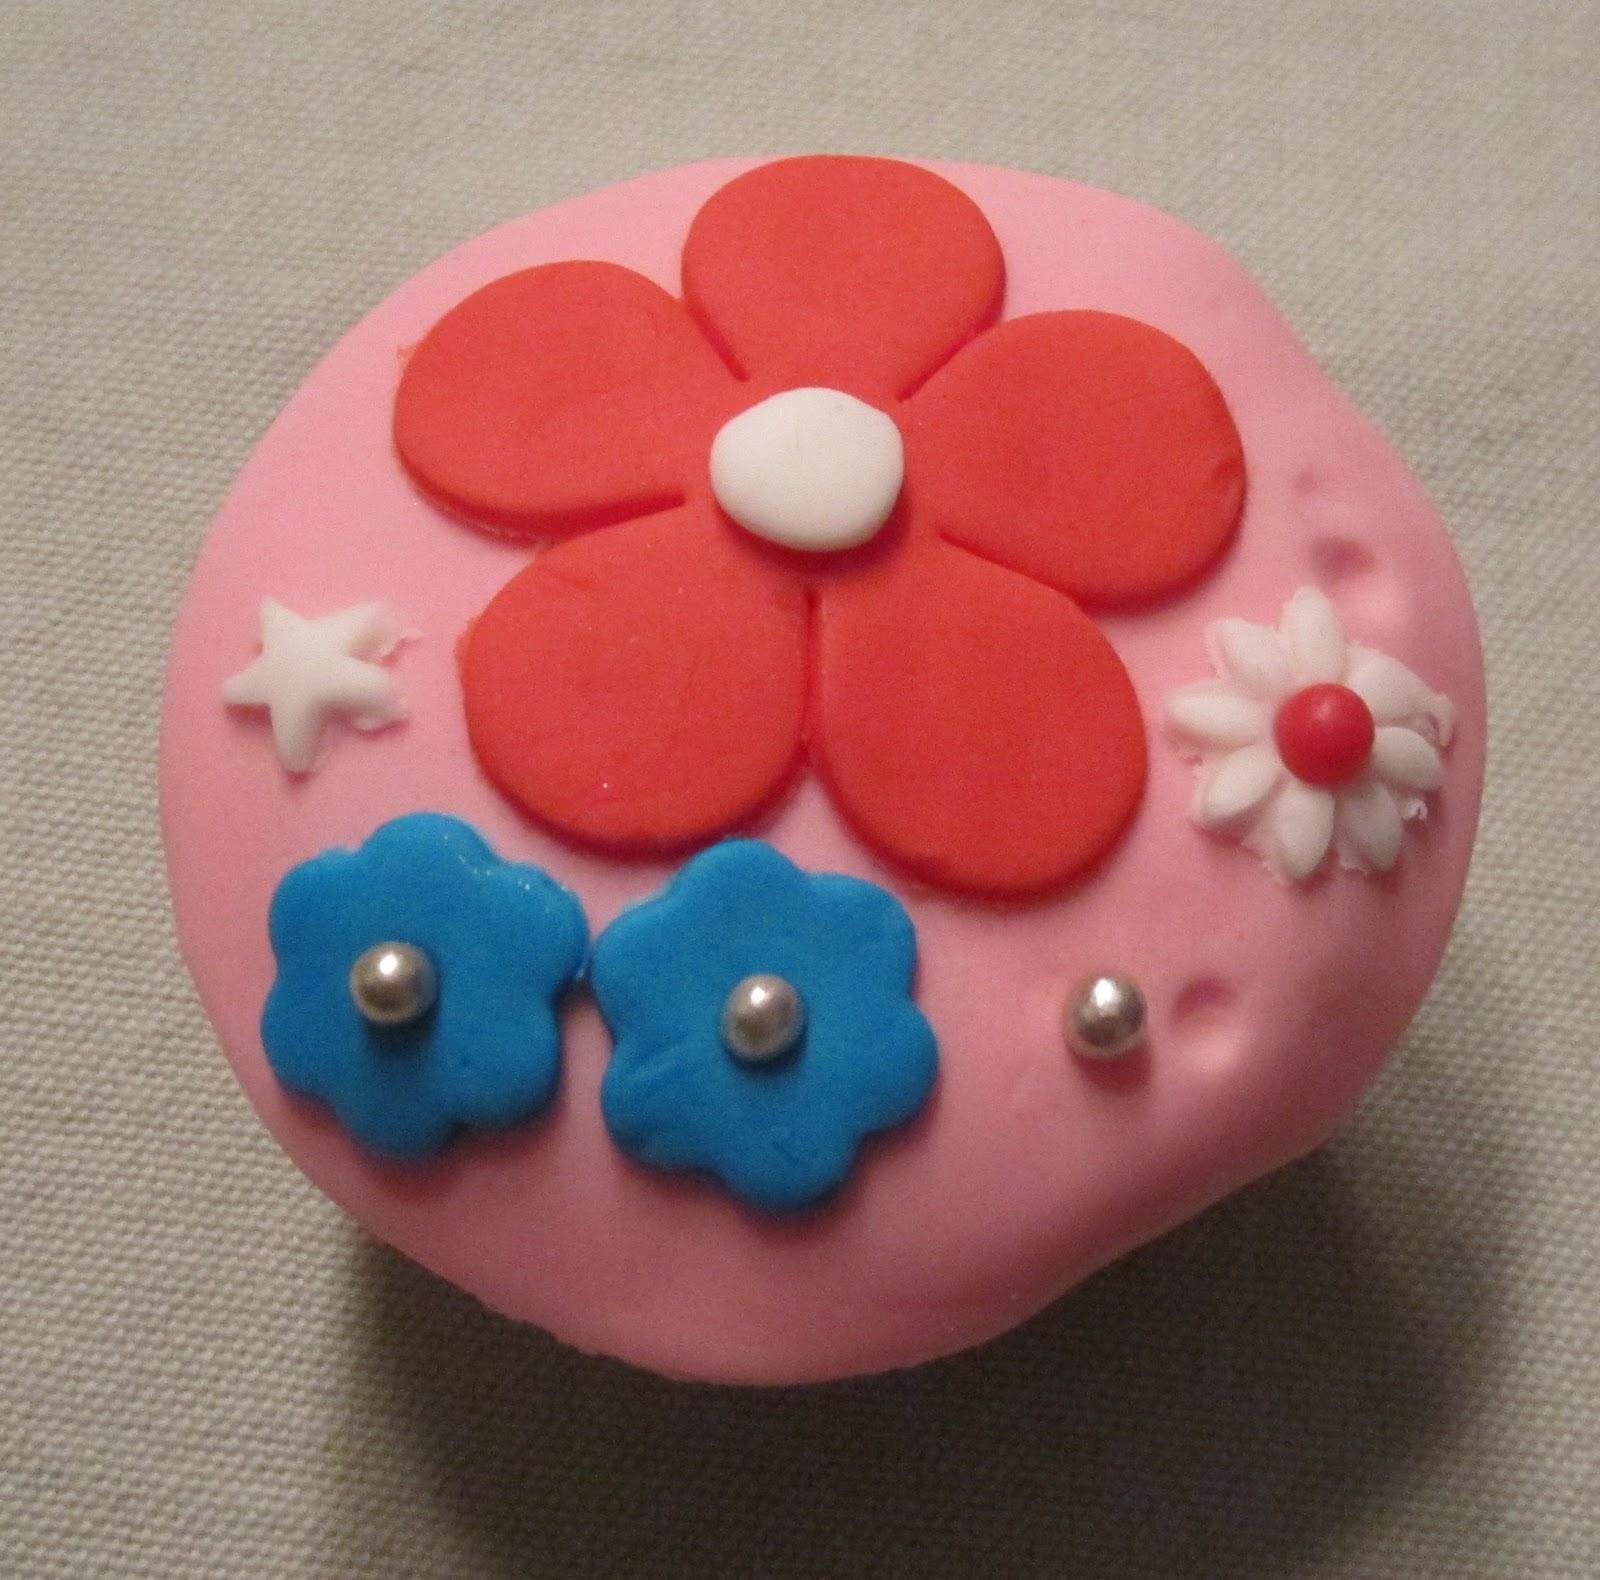 workshop cupcakes versieren cake ideas and designs. Black Bedroom Furniture Sets. Home Design Ideas